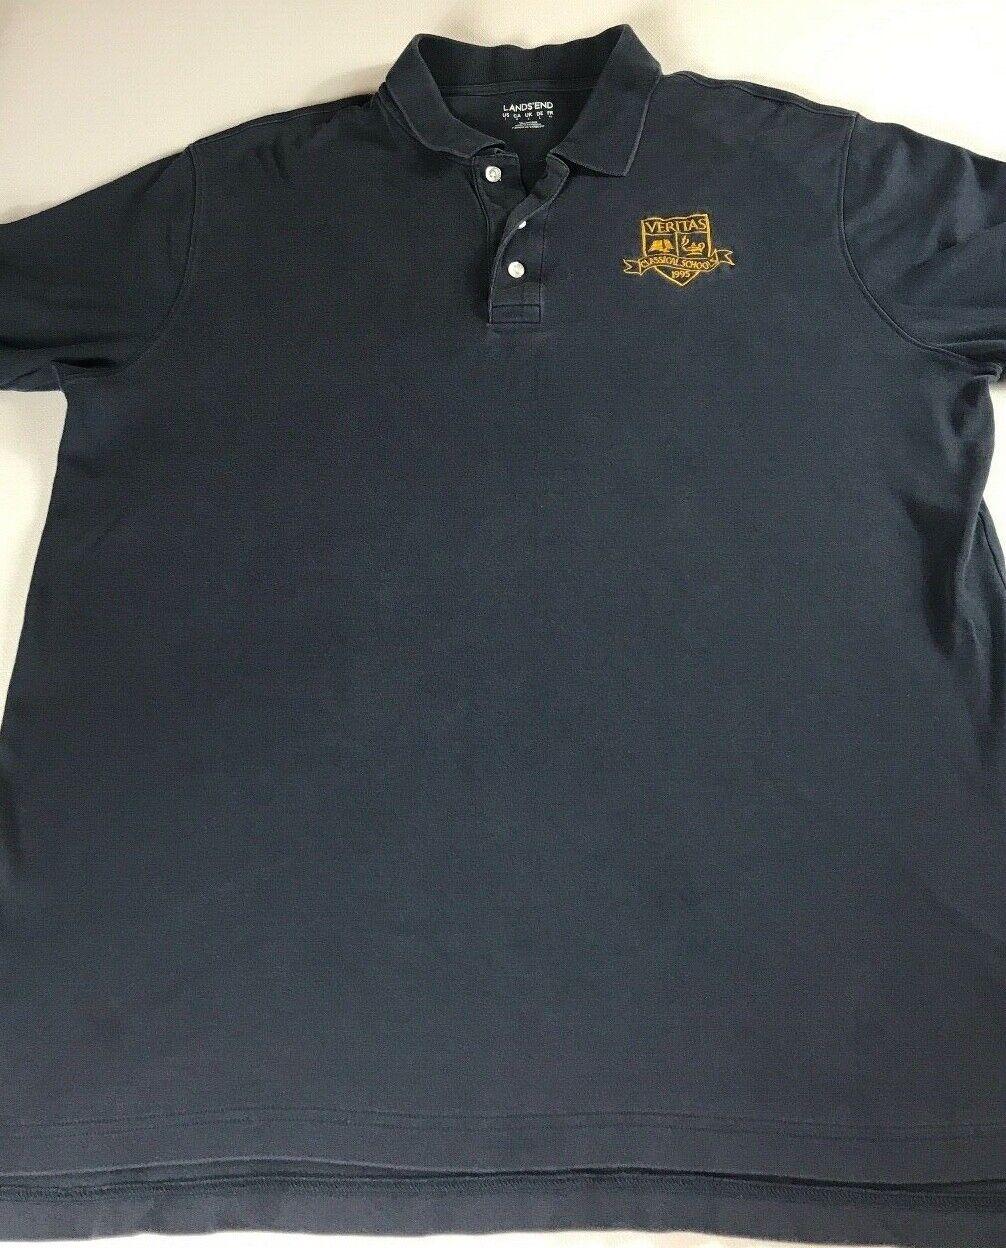 L=44 Under Armour Iowa Hawkeyes Mens Black Performance Polo Shirt